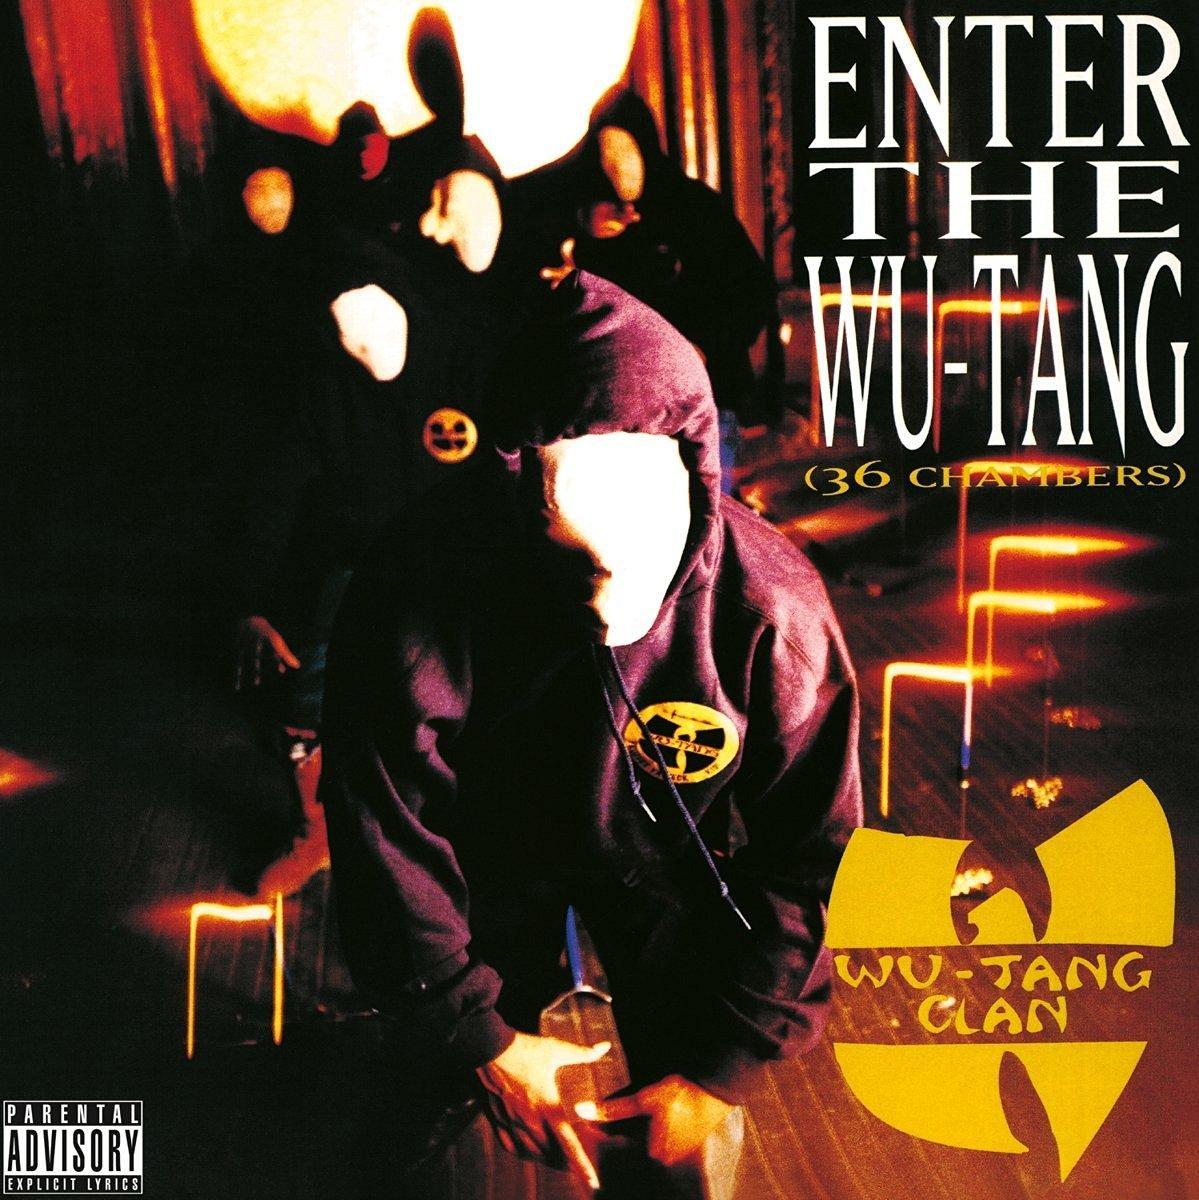 Sélection de Vinyles - Ex: Enter the Wu-Tang Clan (36 Chambers)